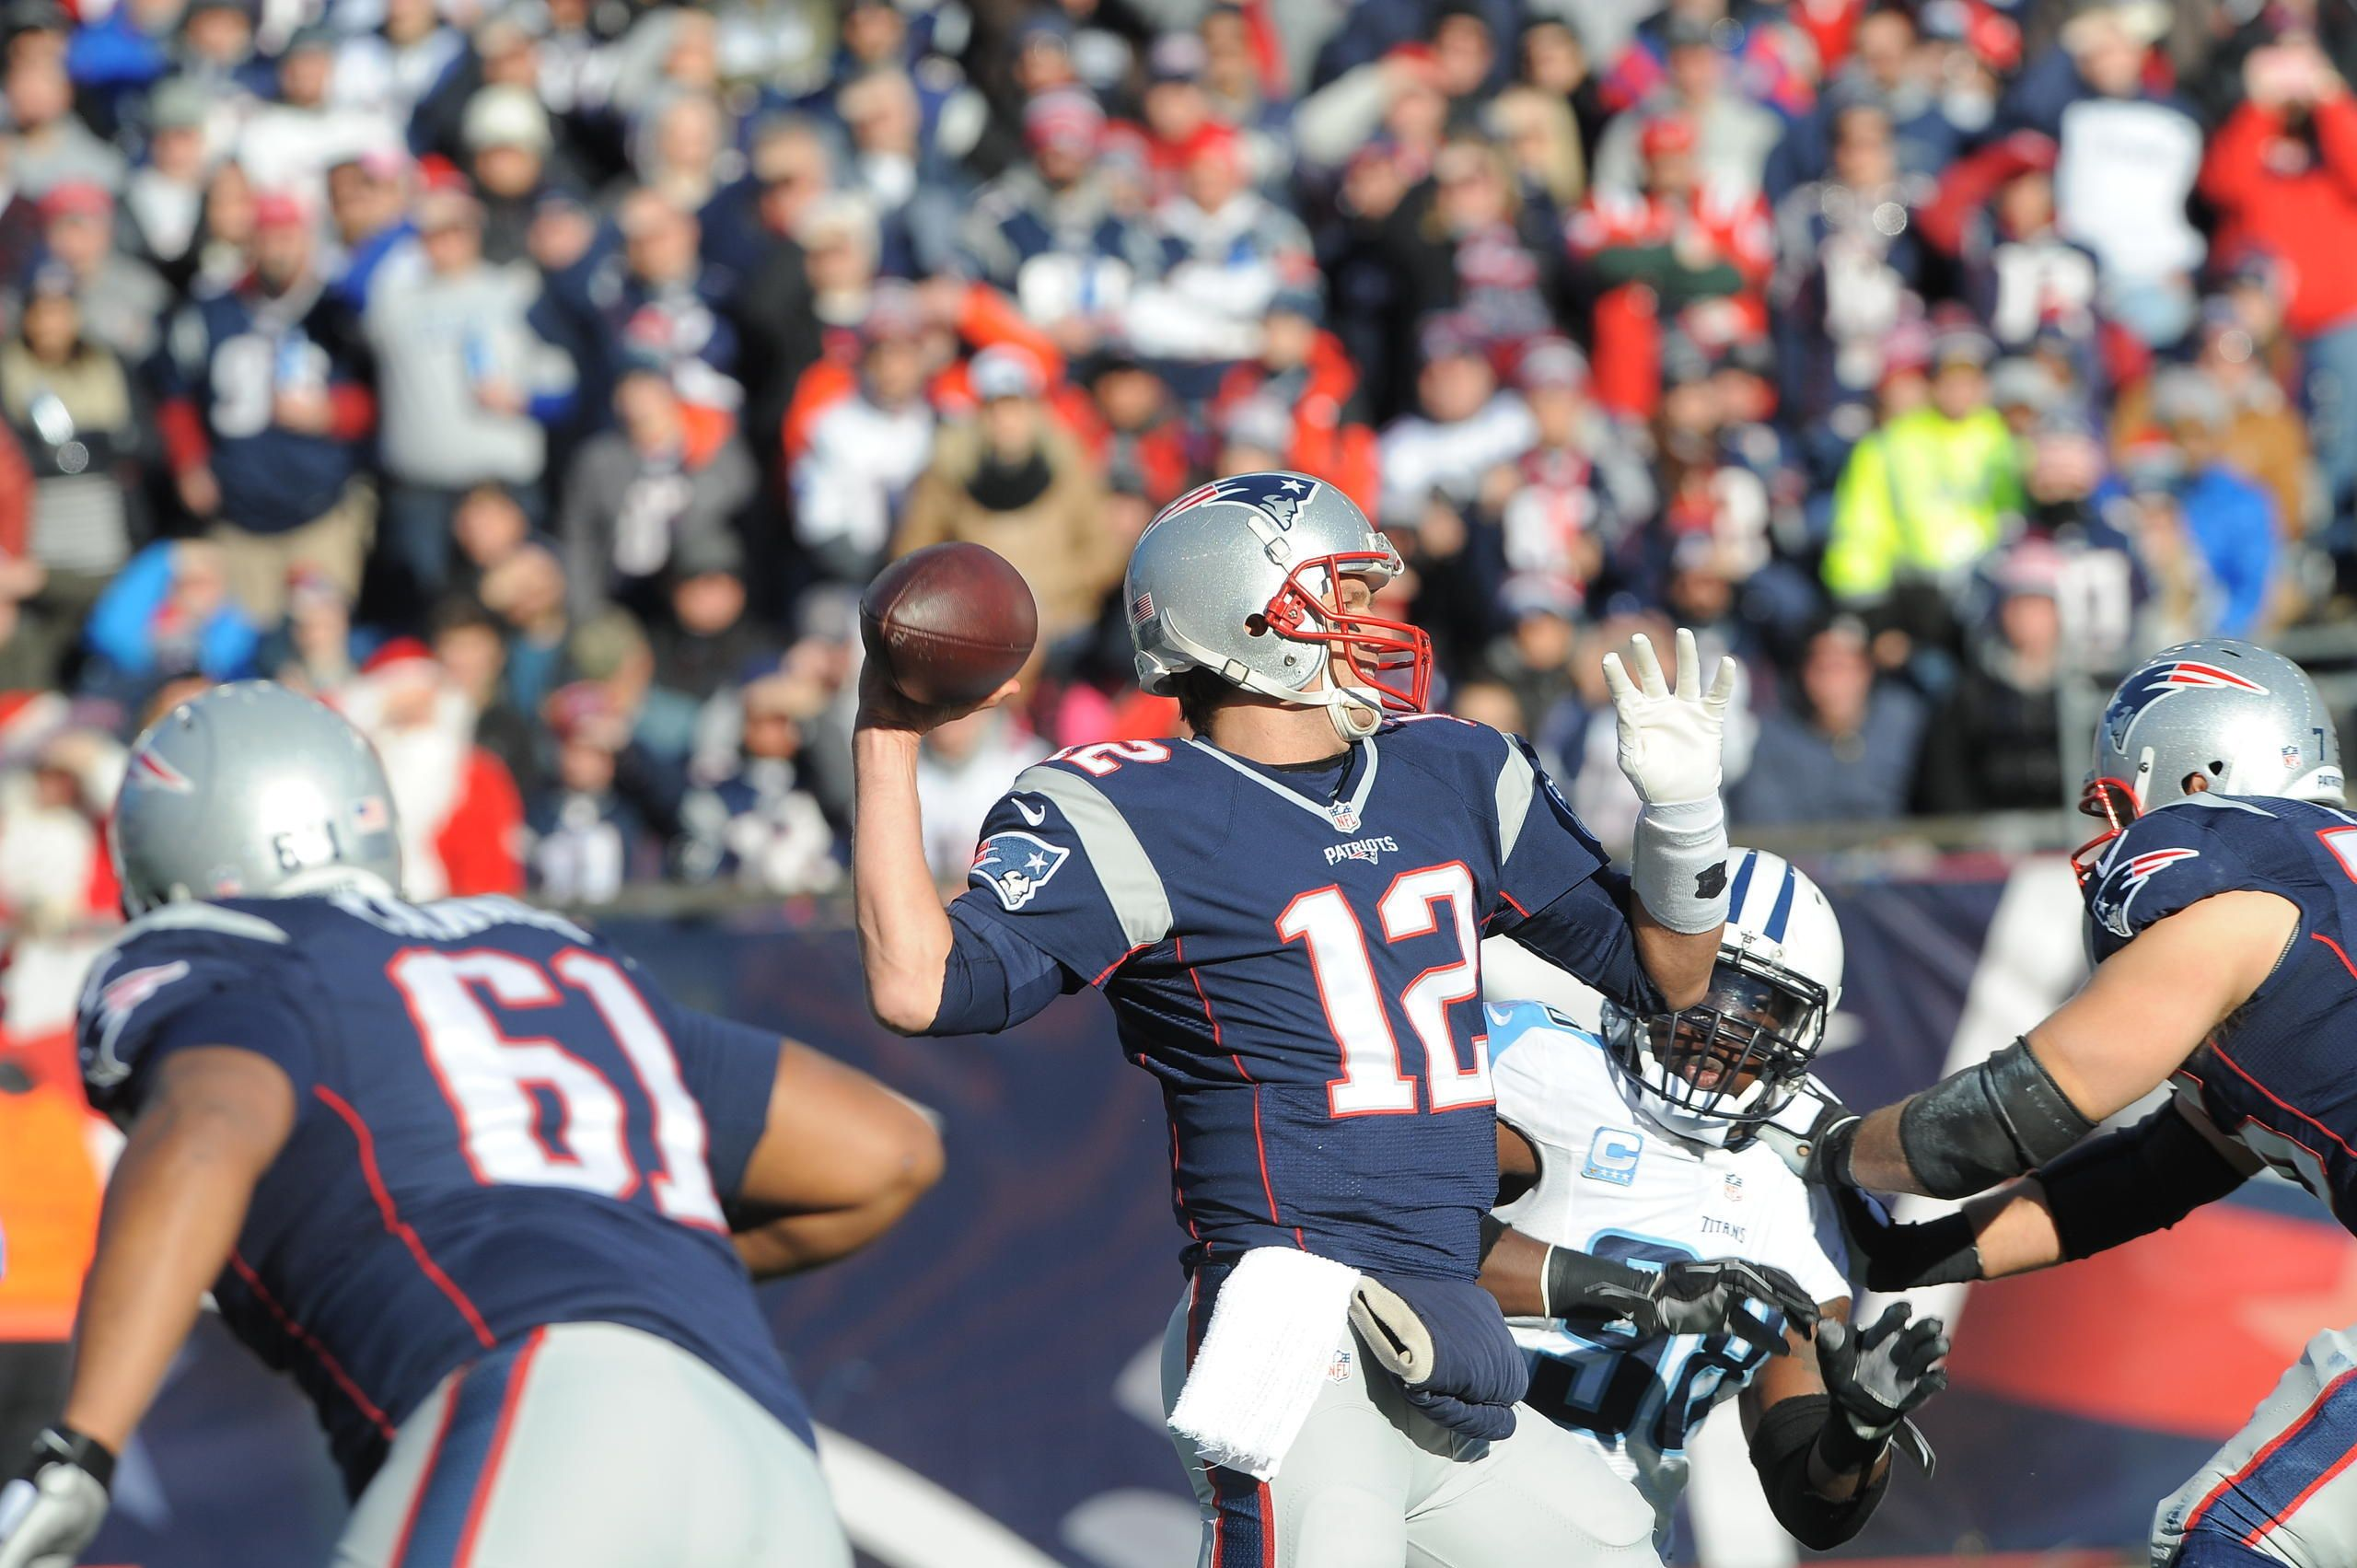 Game Day Photos Titans At Patriots Week 15 Patriots New England Patriots Titans